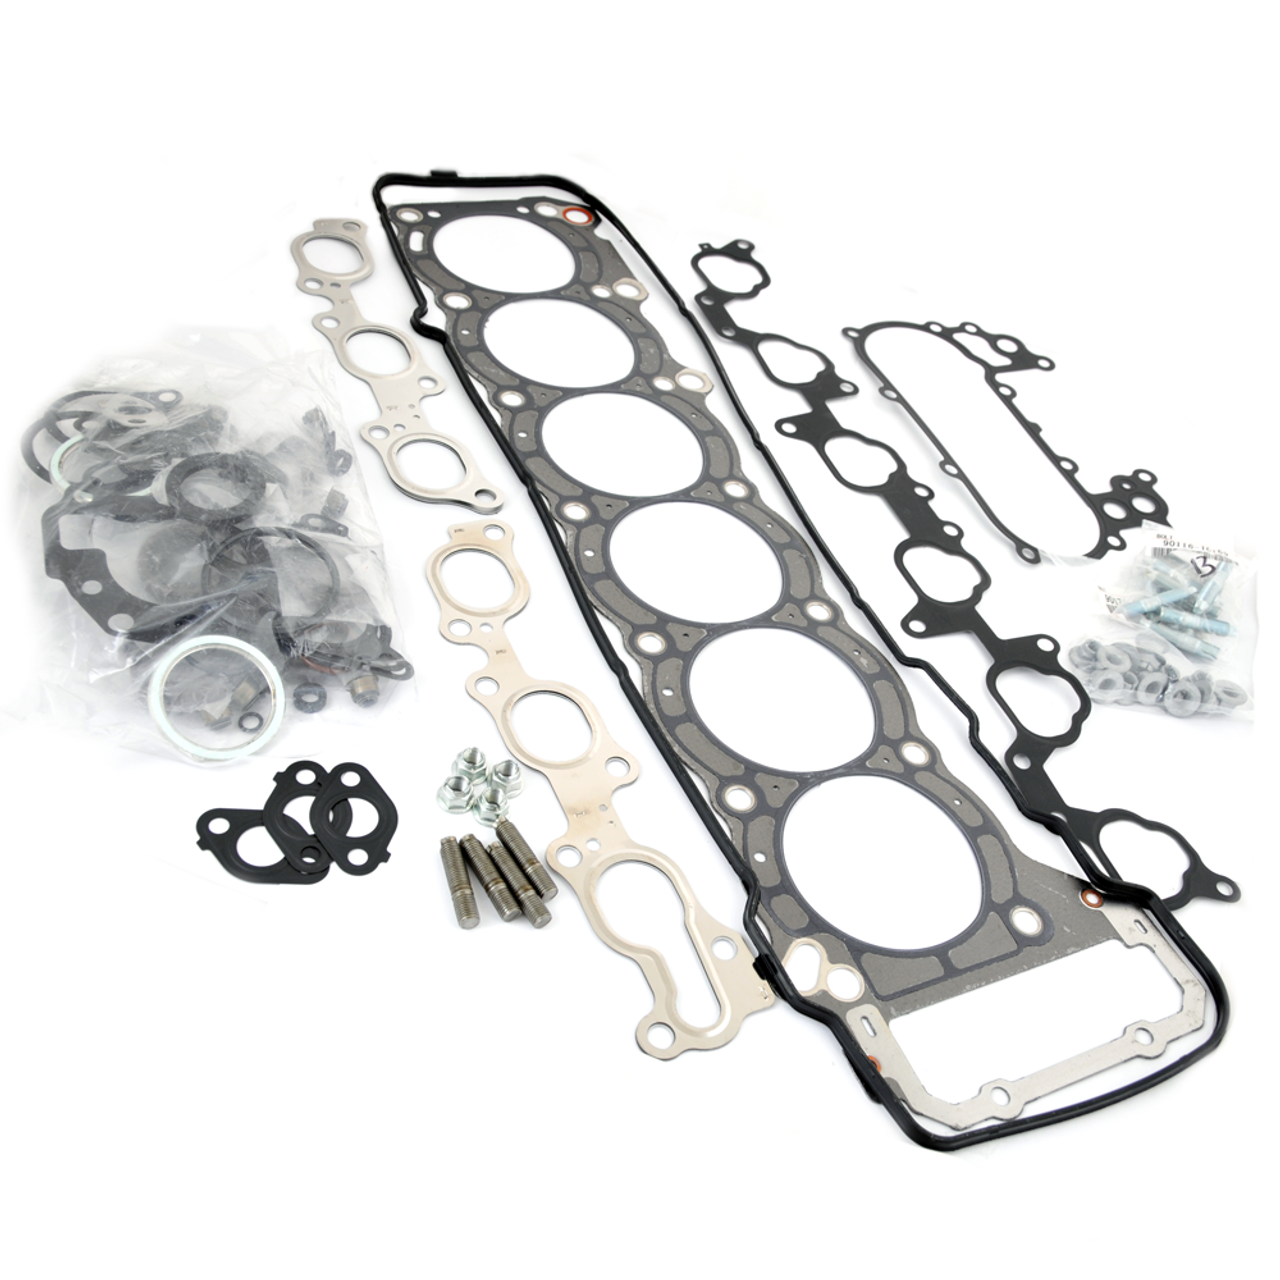 80 Series 1FZ Complete Head Gasket Kit (HGK-1FZ)